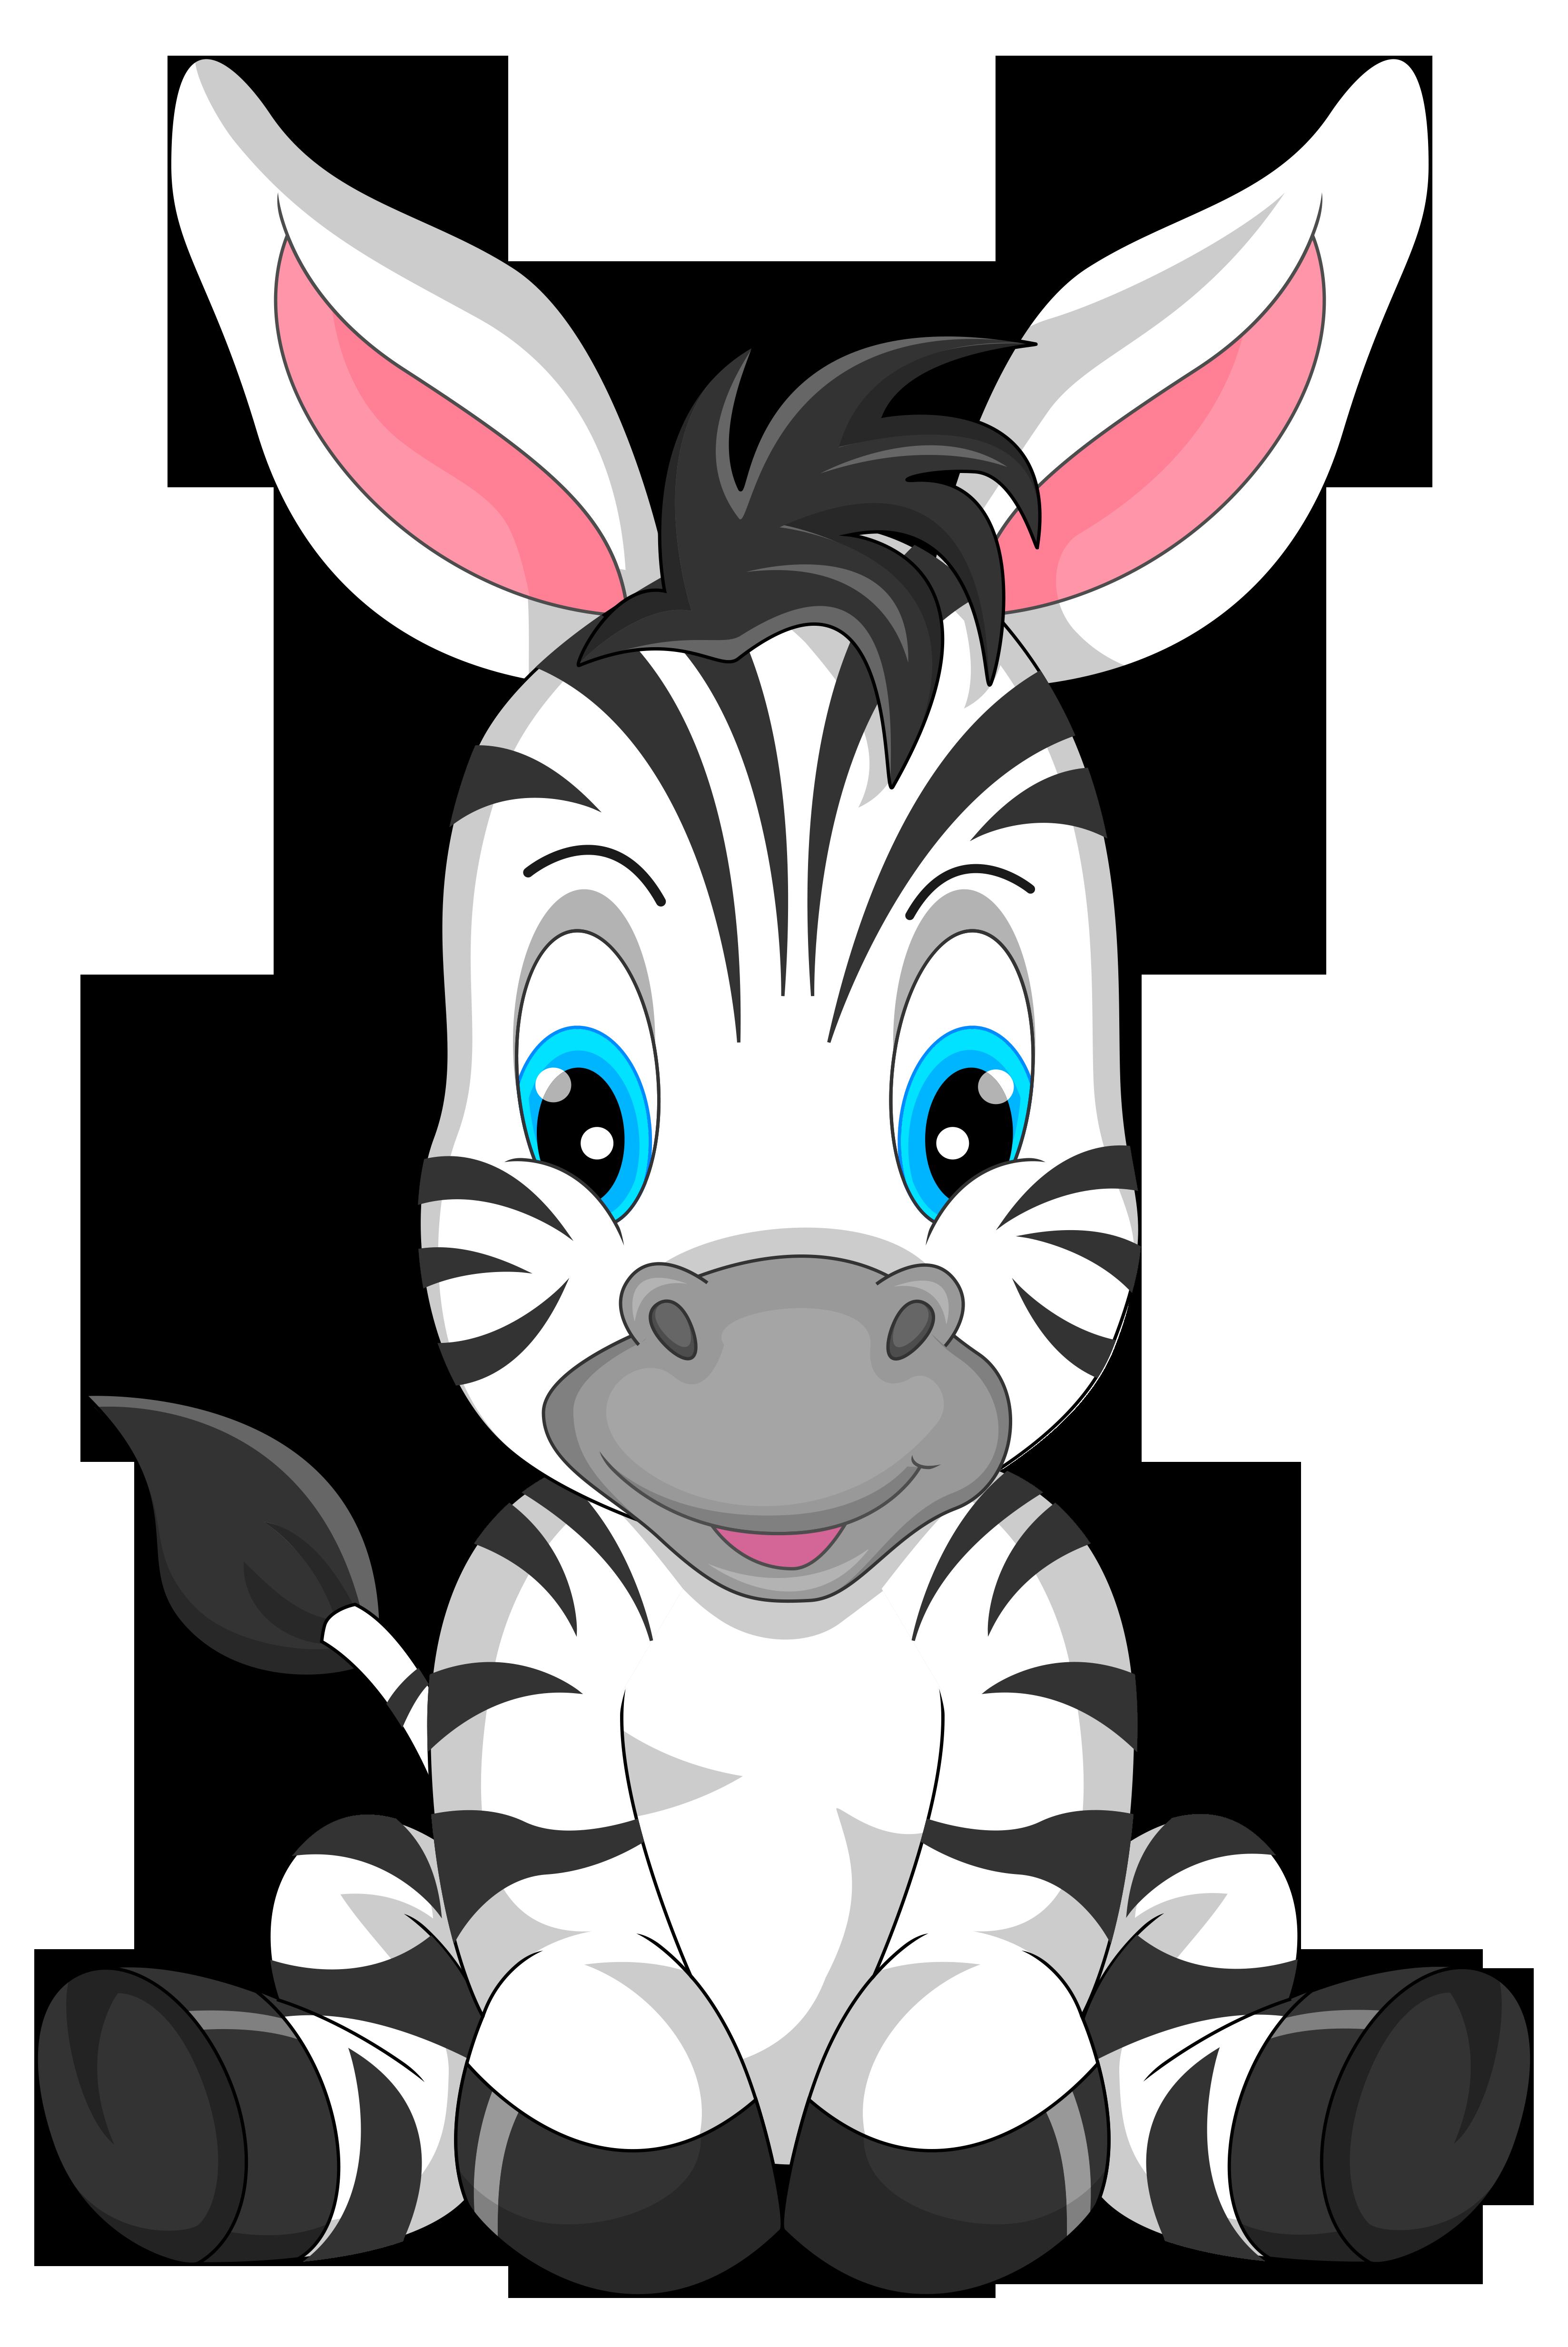 Cute cartoon png image. Clipart zebra zebra bow